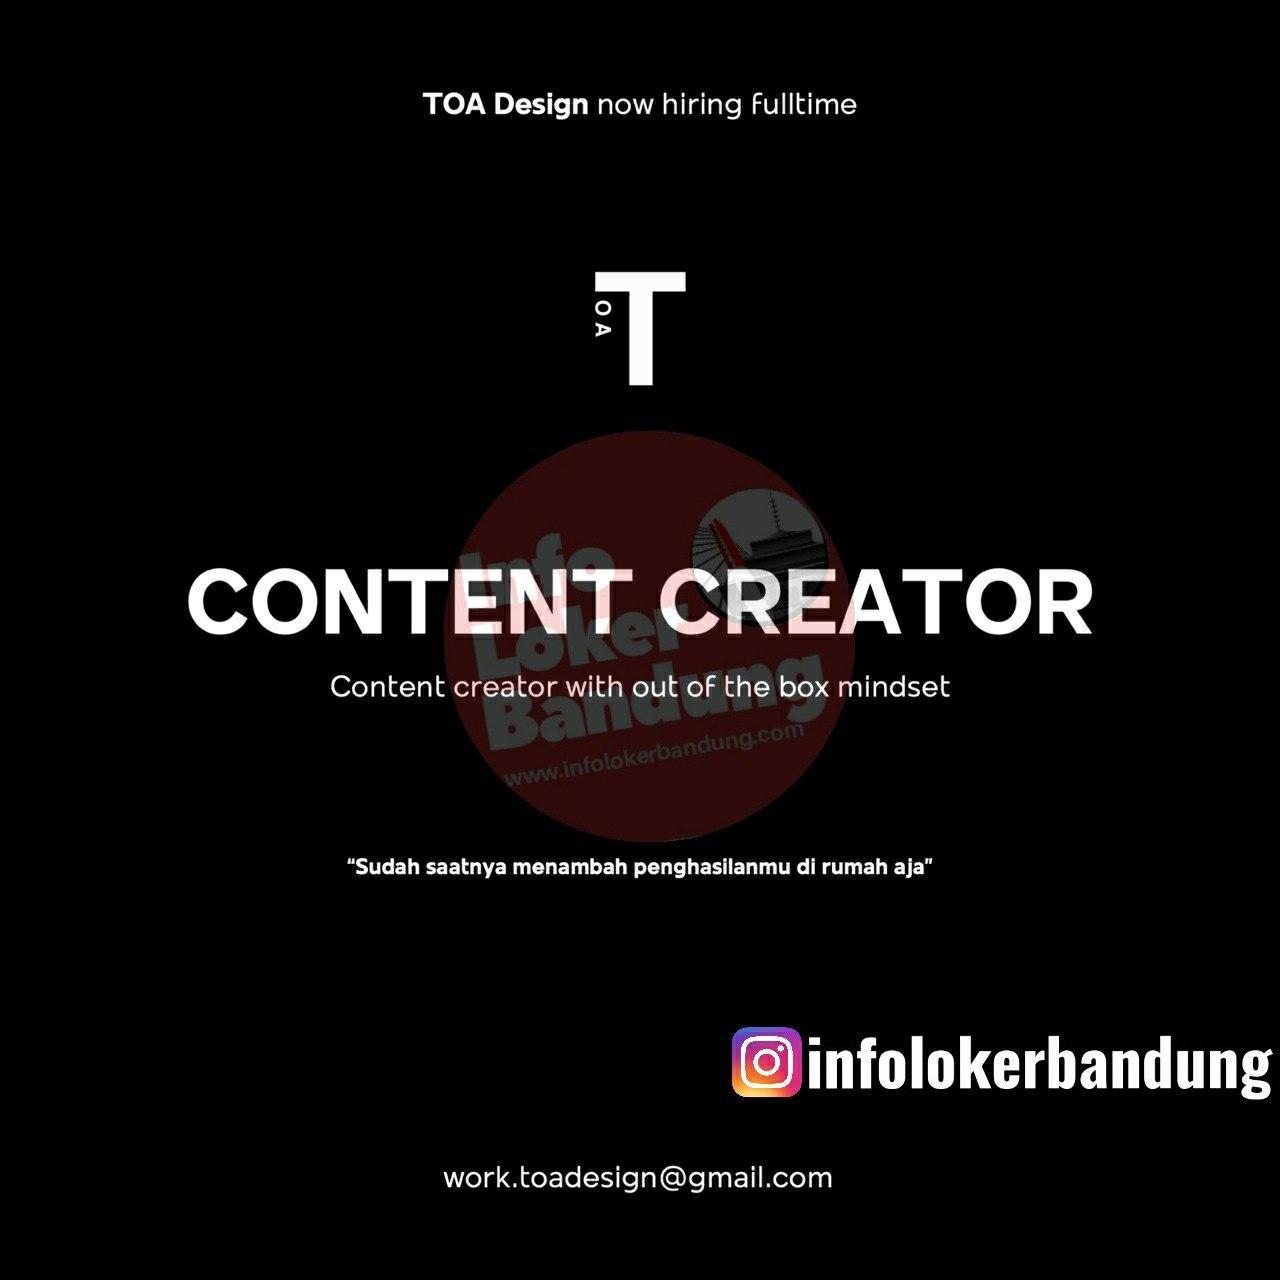 Lowongan Kerja Content Creator TOA Design Bandung Mei 2020